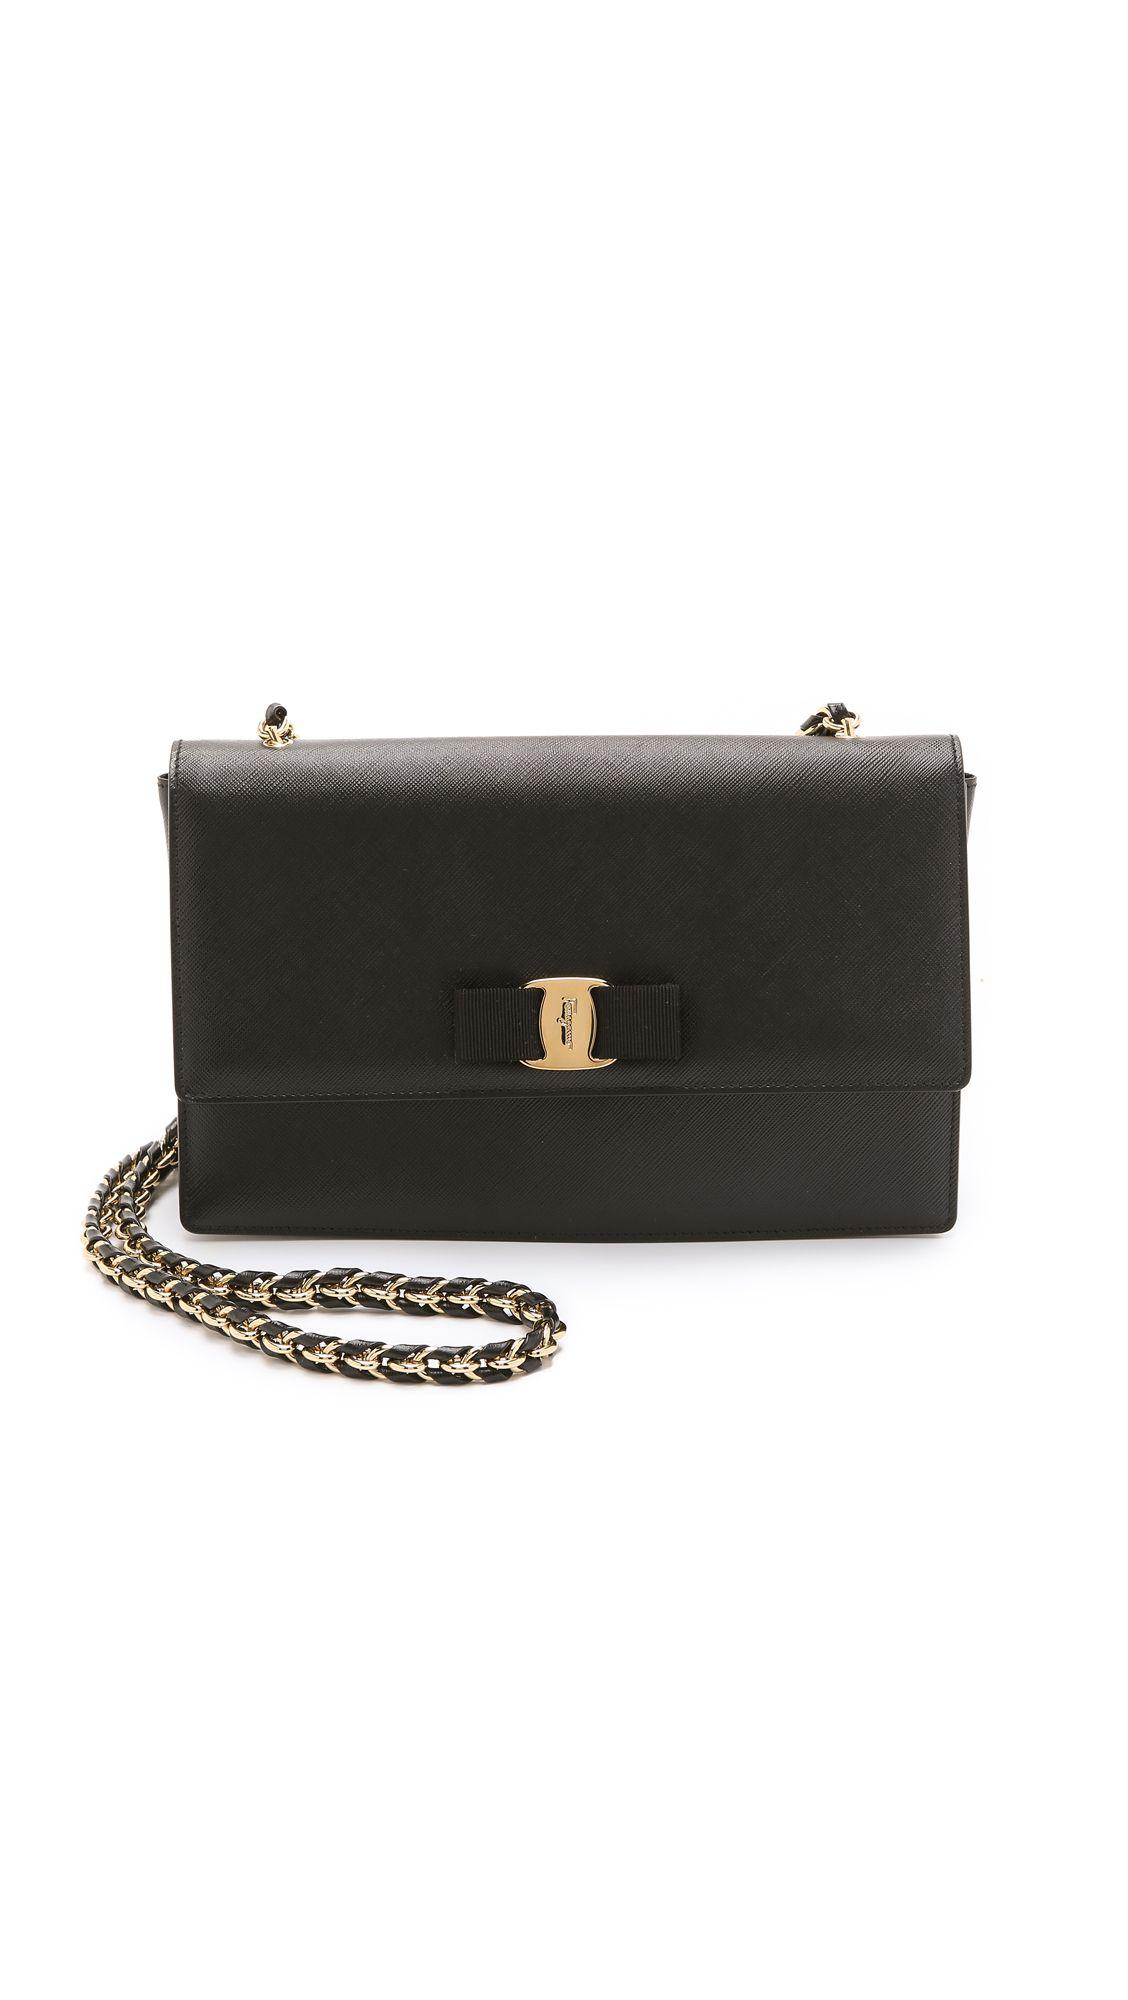 333cb6f8c0 Salvatore Ferragamo Ginny Cross Body Bag